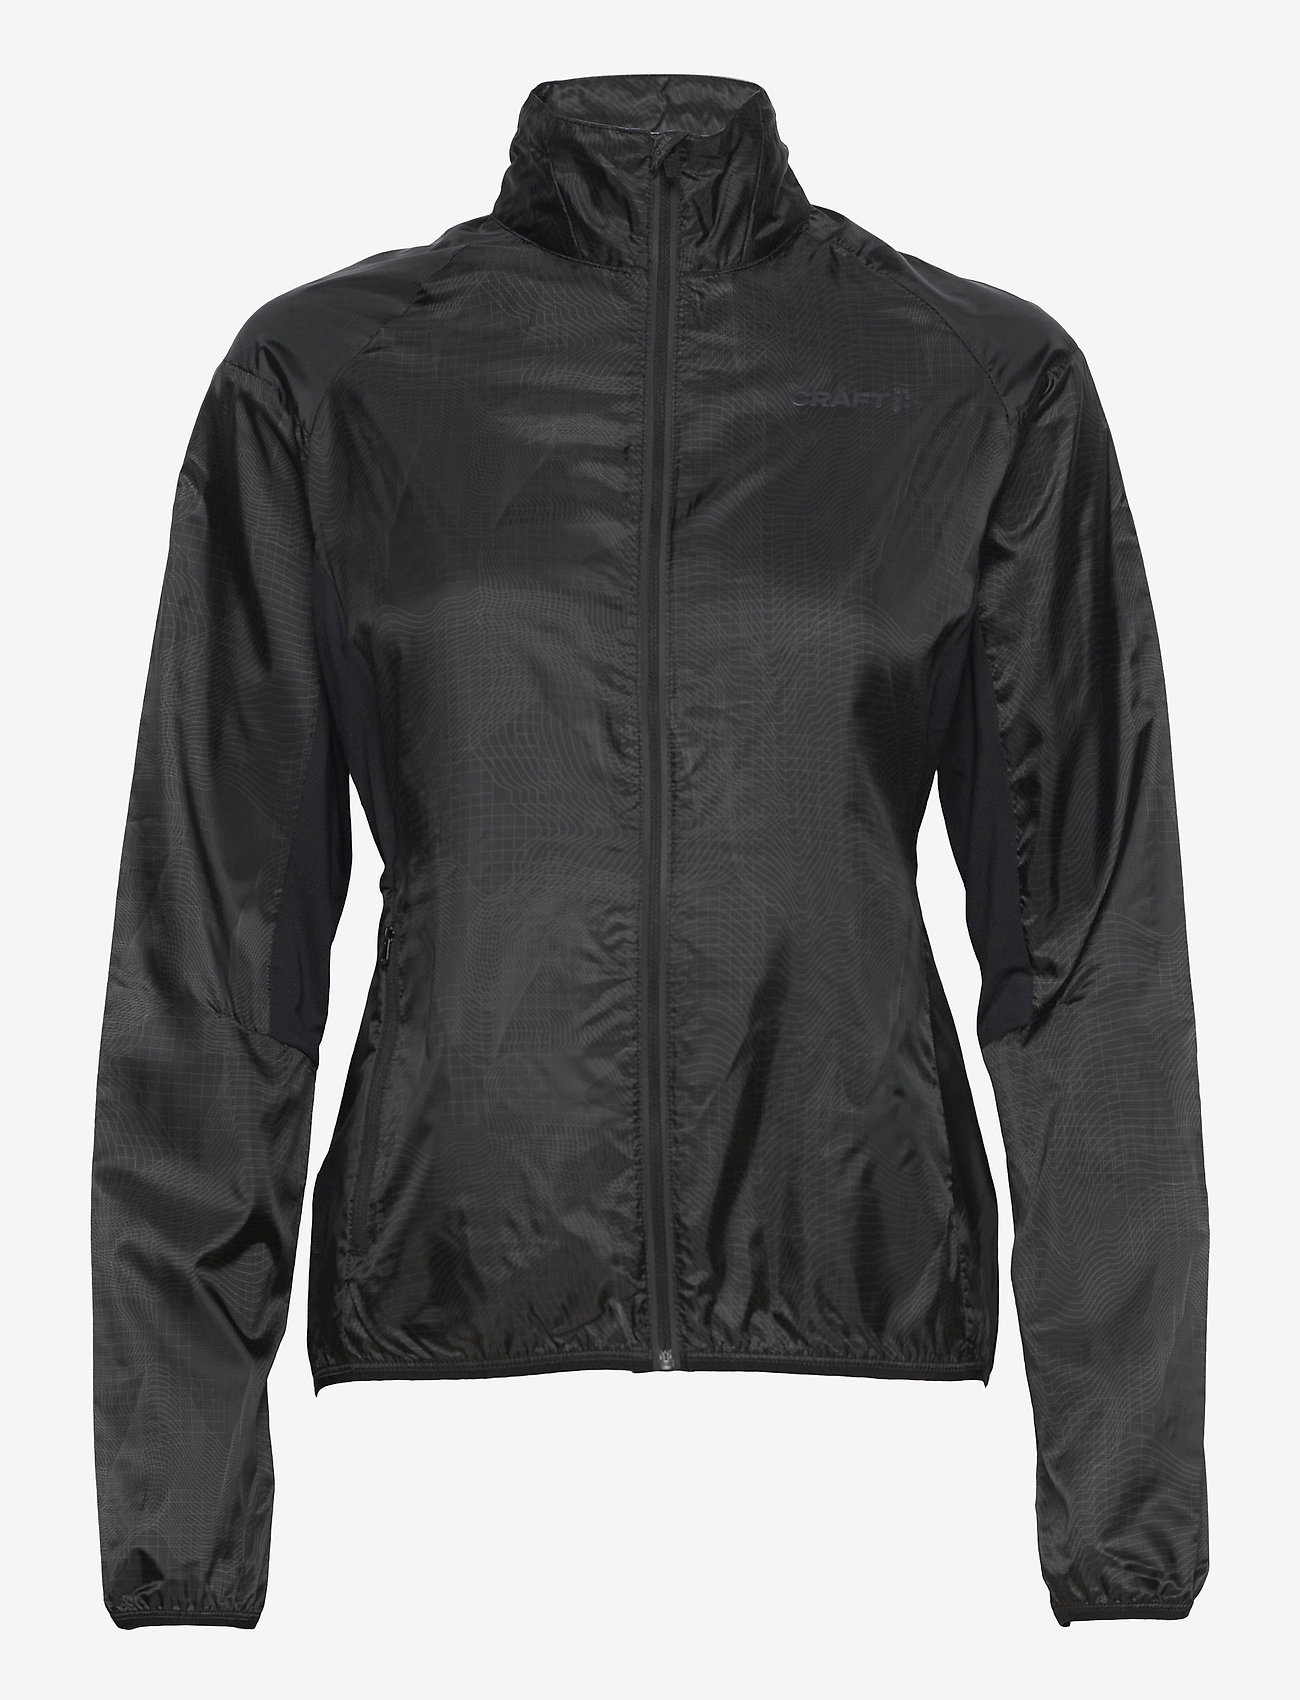 Craft - PRO HYPERVENT JACKET W - training jackets - black - 0